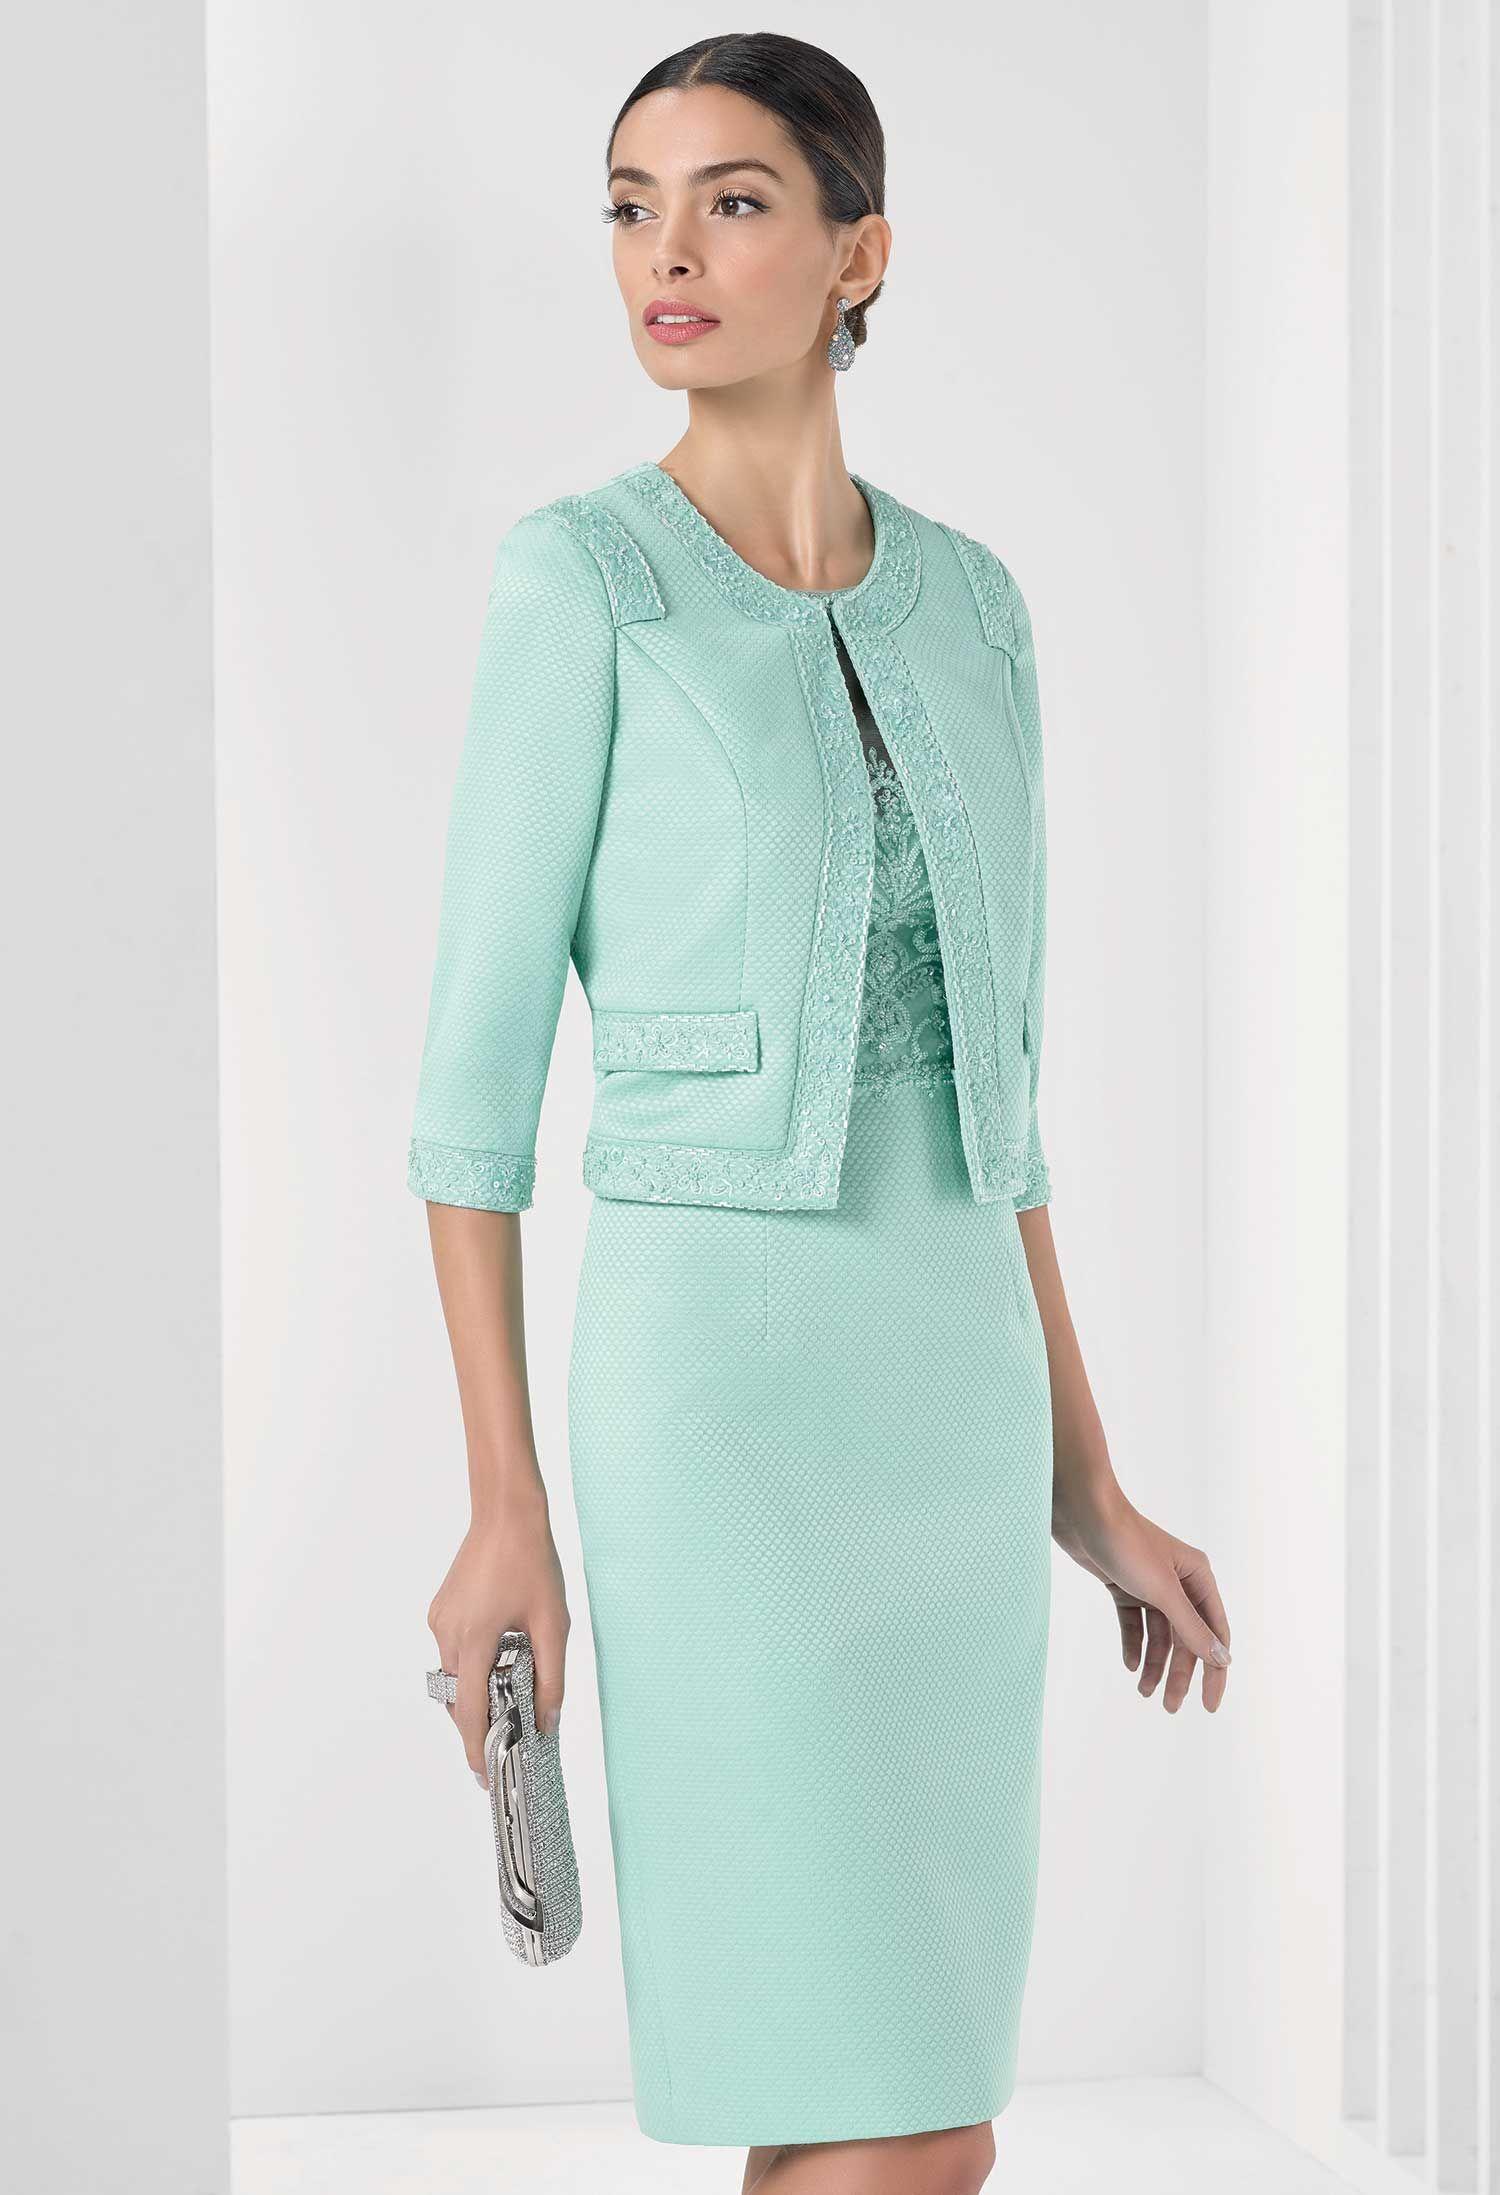 photo of ladies formal daywear design 03 detail by Zeila | dress ...